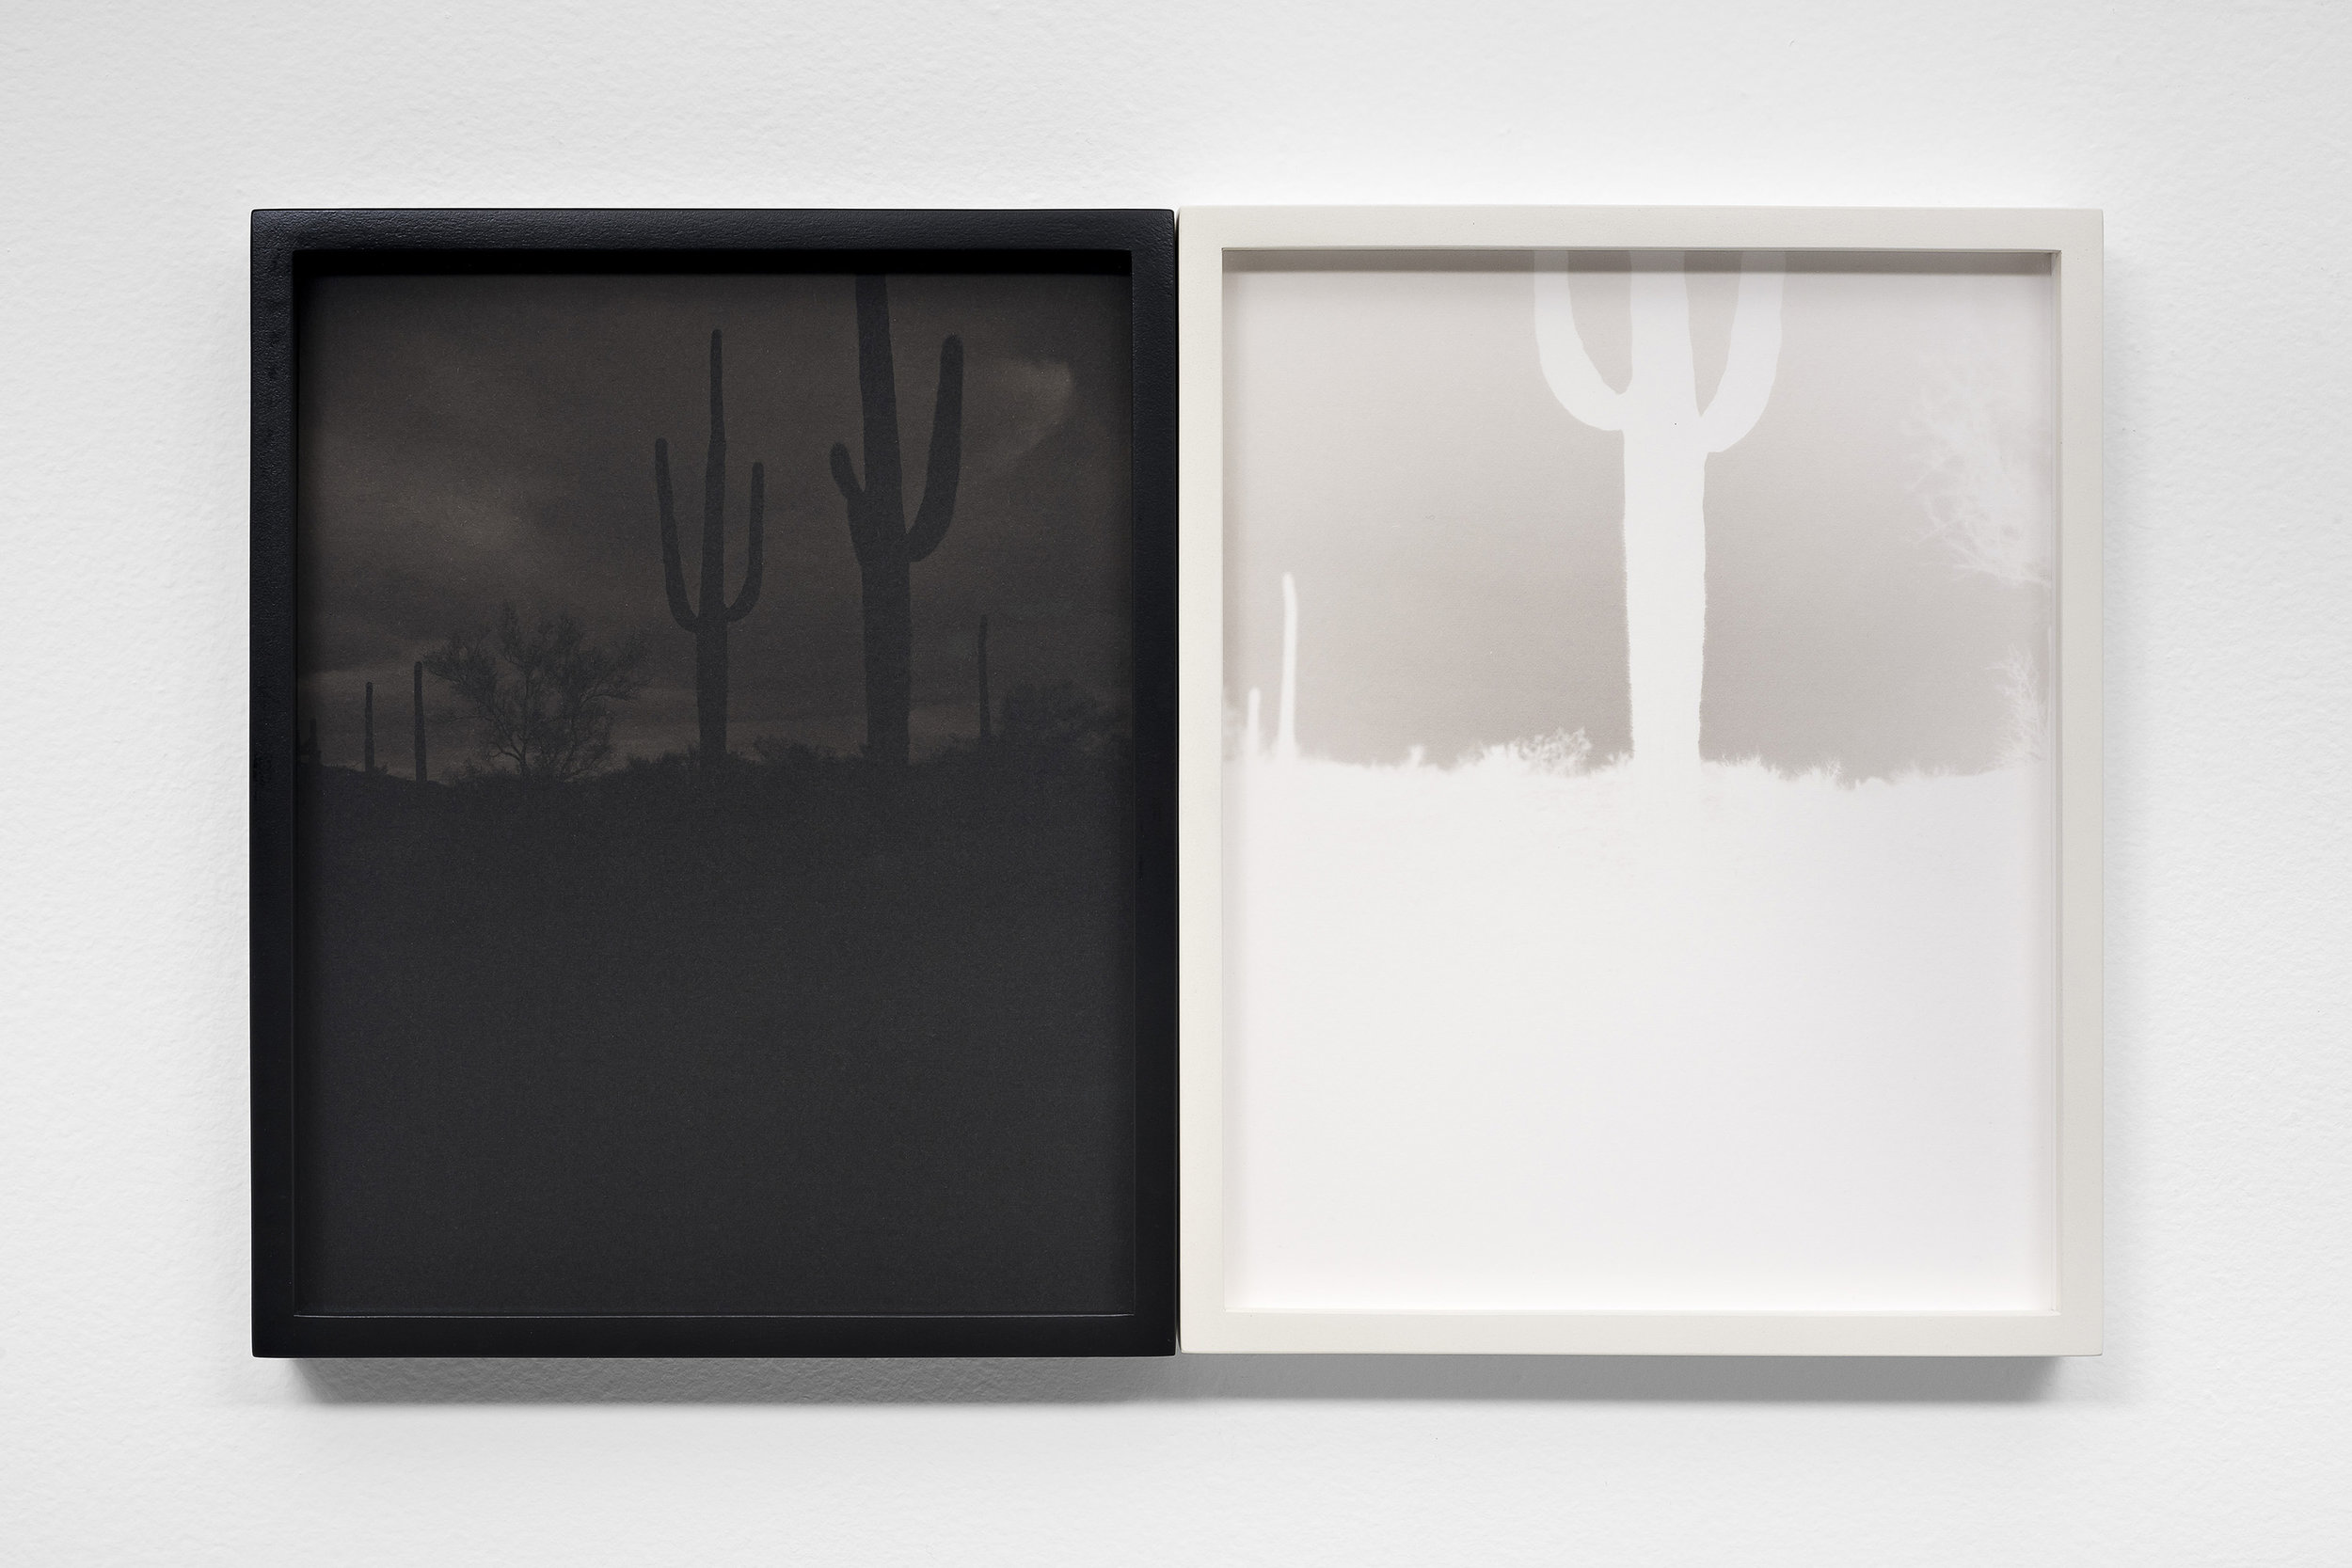 SCOTT B. DAVIS Saguaro Forest, Sauceda Mountains, Arizona, 2017 Unique paper negative palladium / platinum prints, diptych 10 x 16 inches